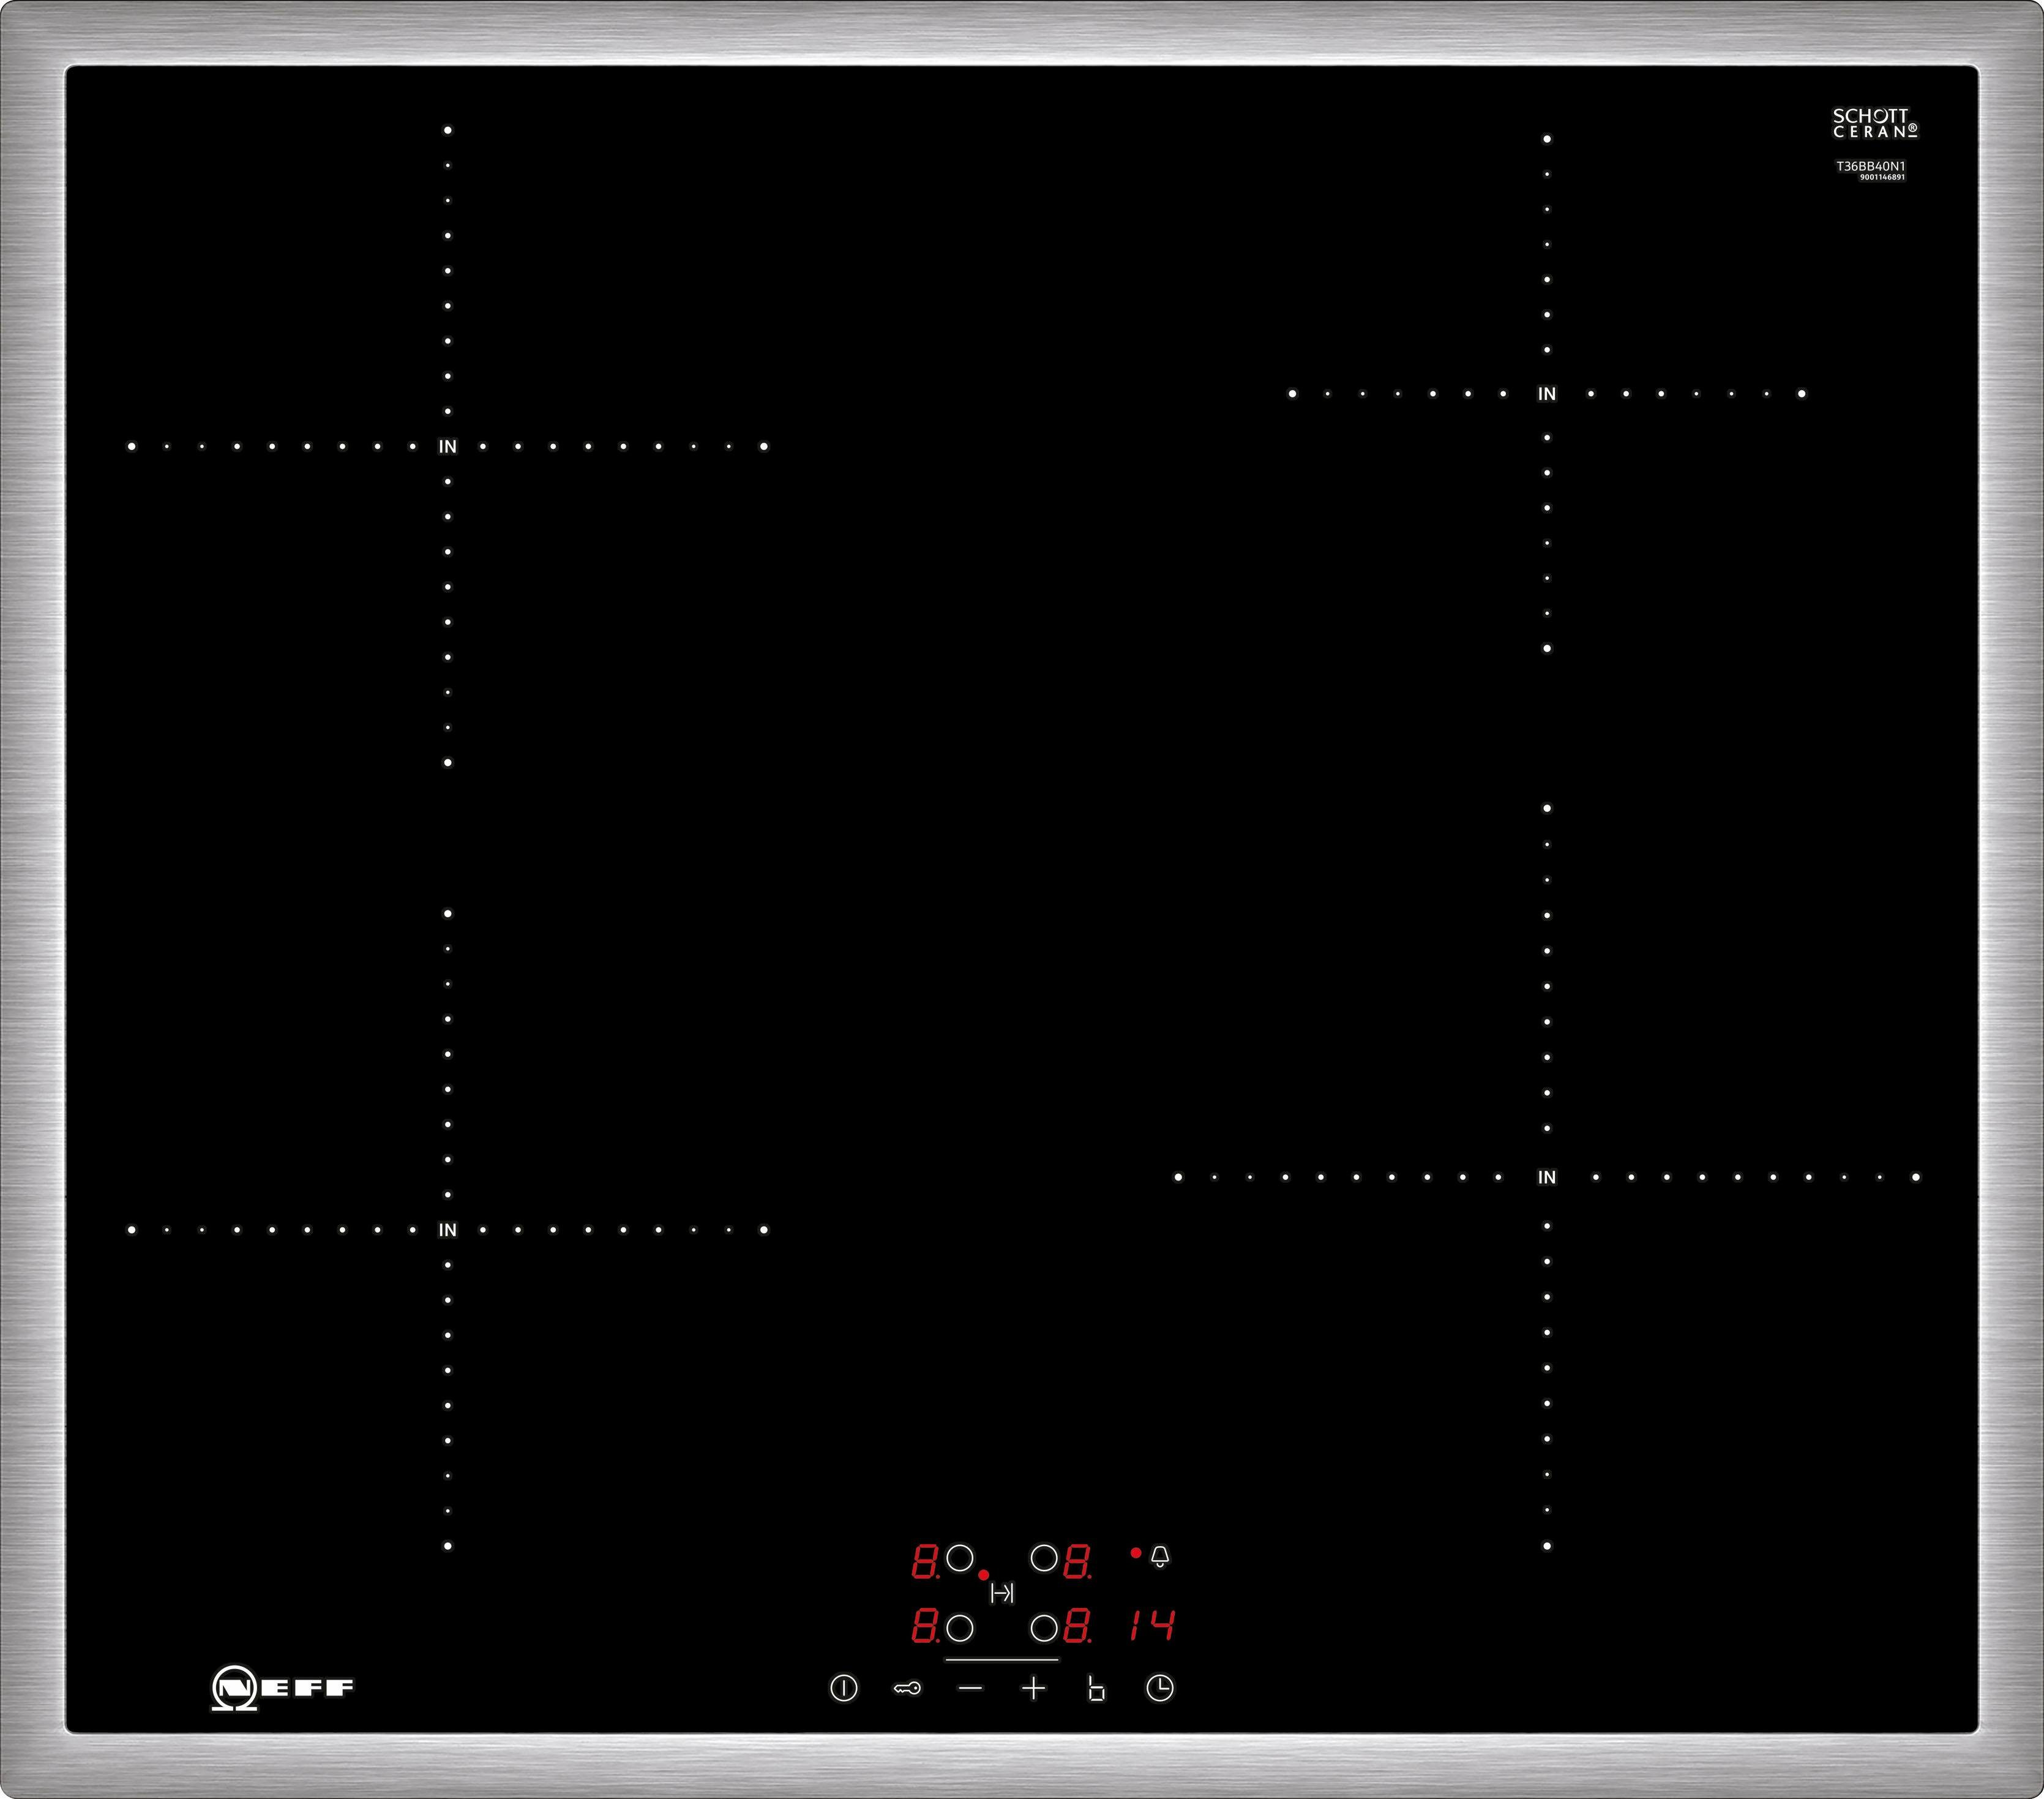 Neff Induktions-Kochfeld mit TouchControl-Bedienung TBB3640N / T36BB40N1